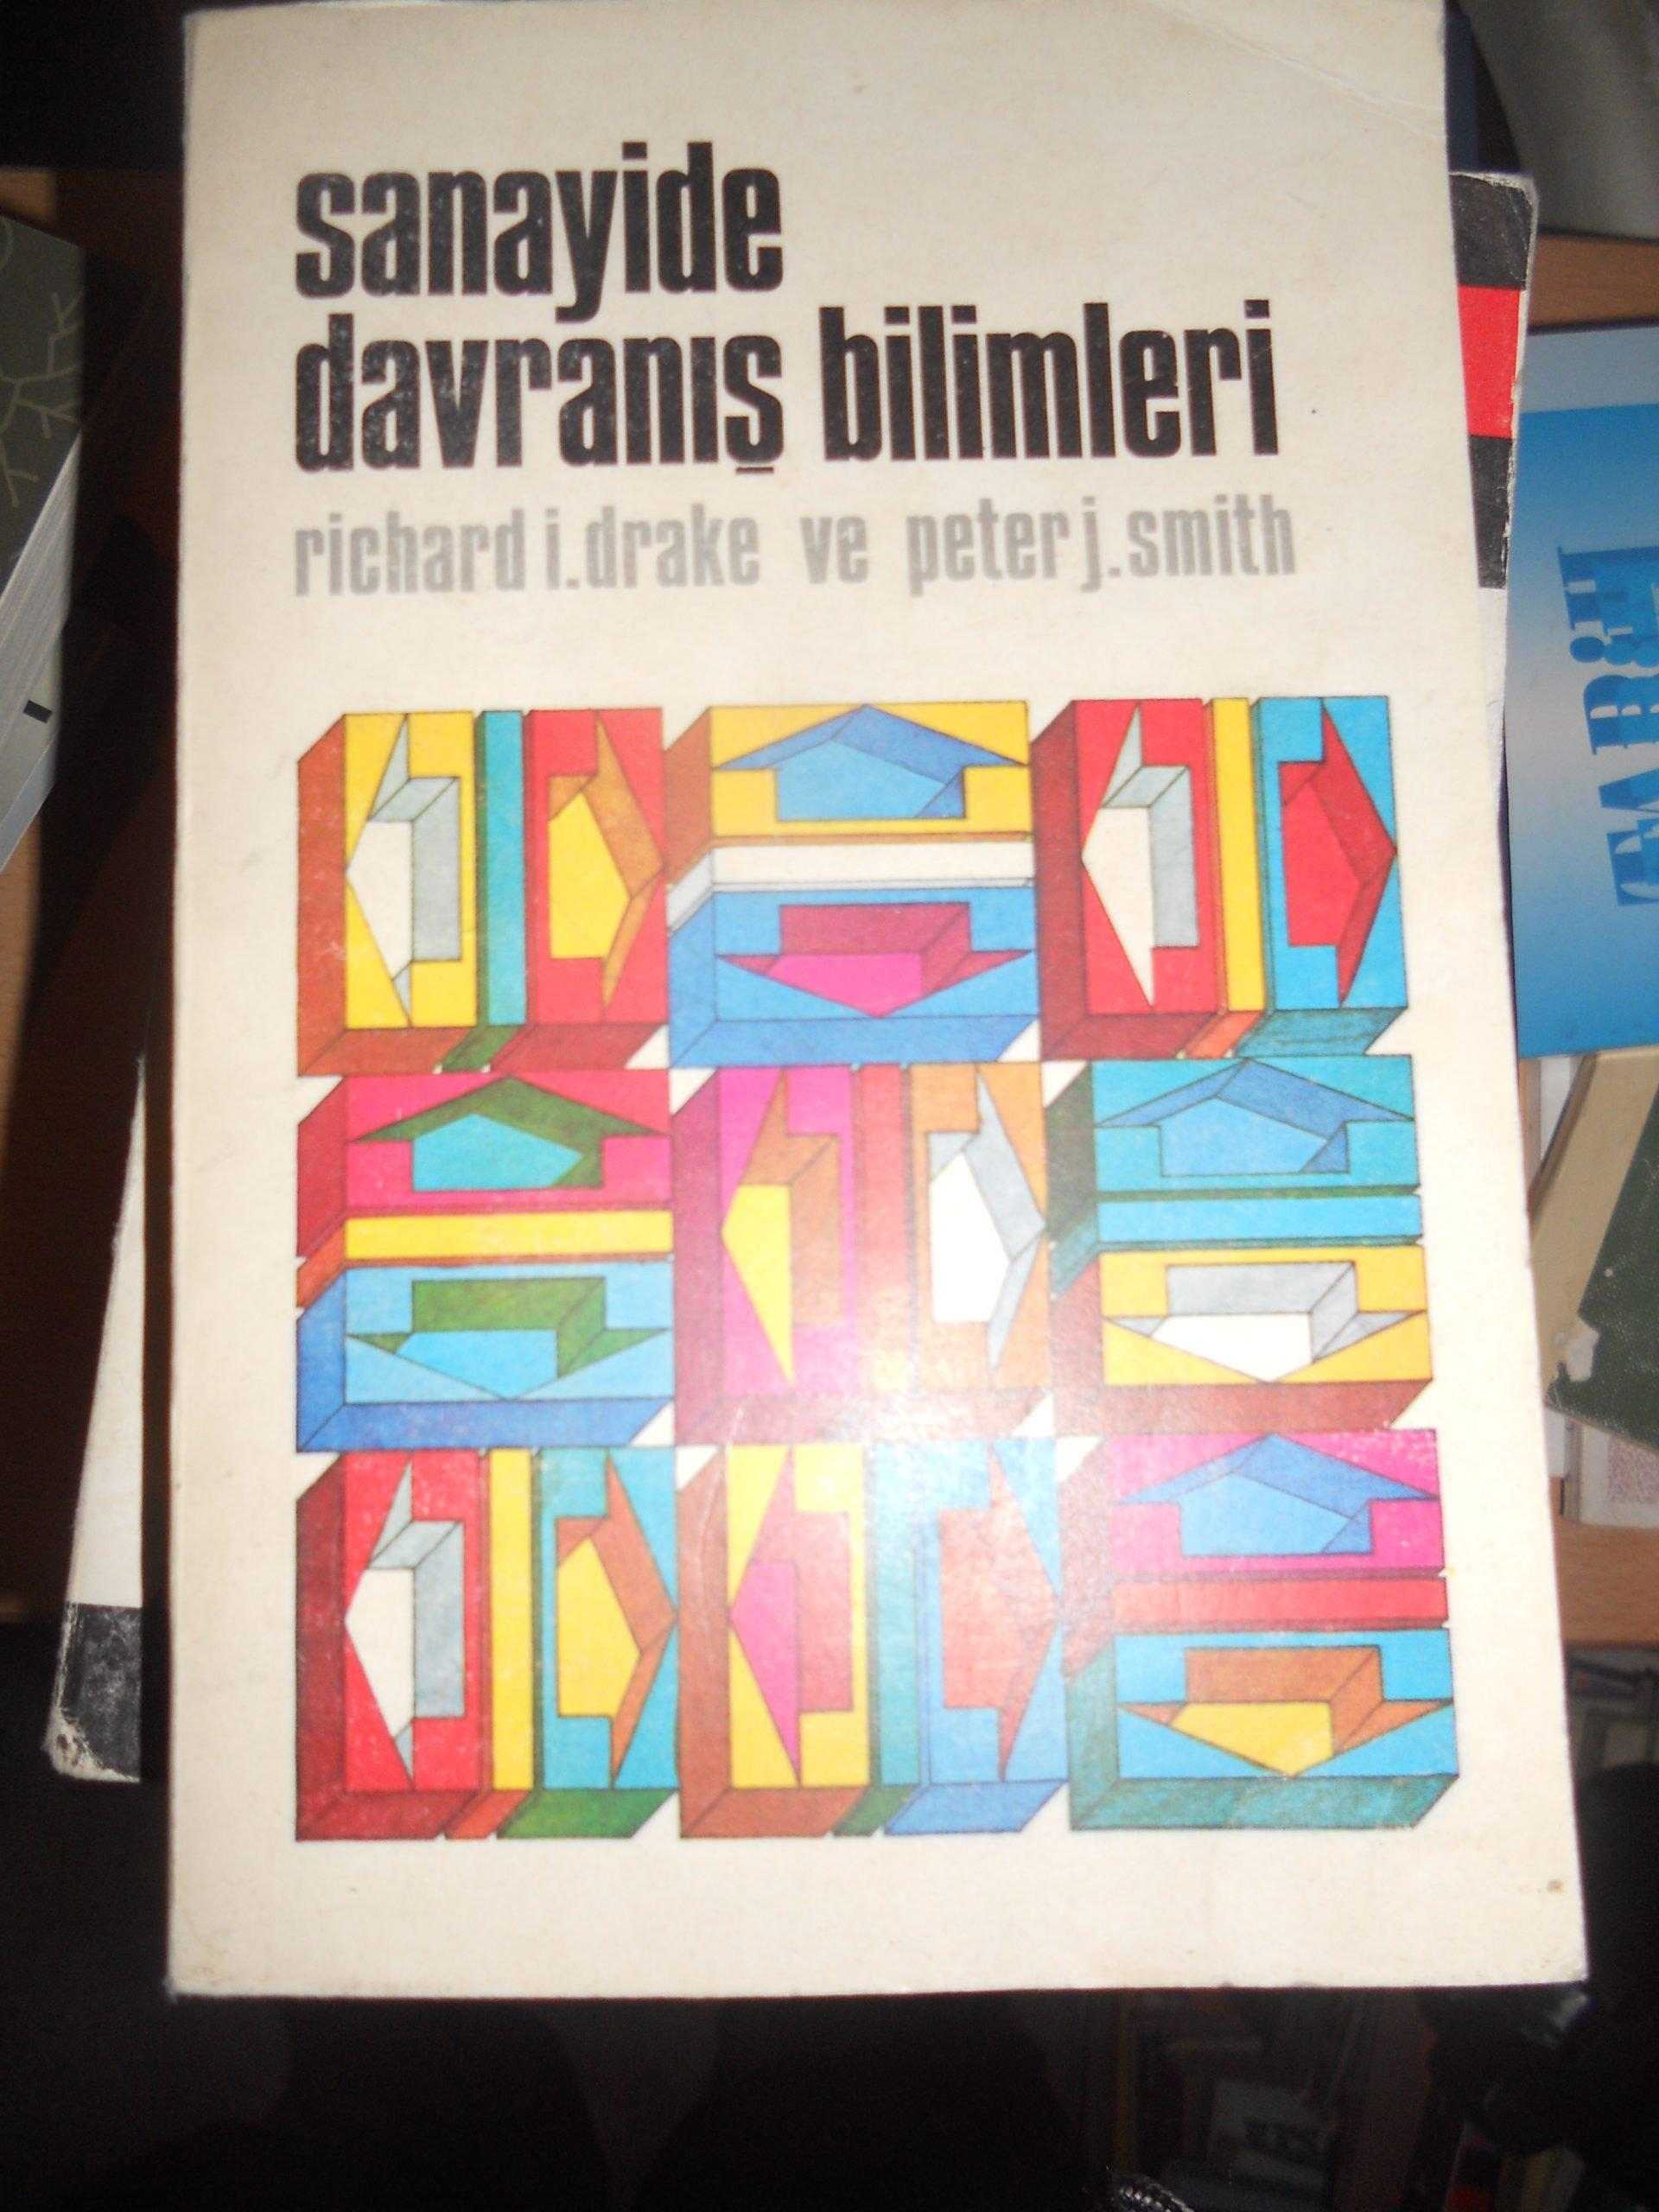 SANAYİDE DAVRANIŞ BİLİMLERİ/richard i.drake/Peter j.smith / 15 TL